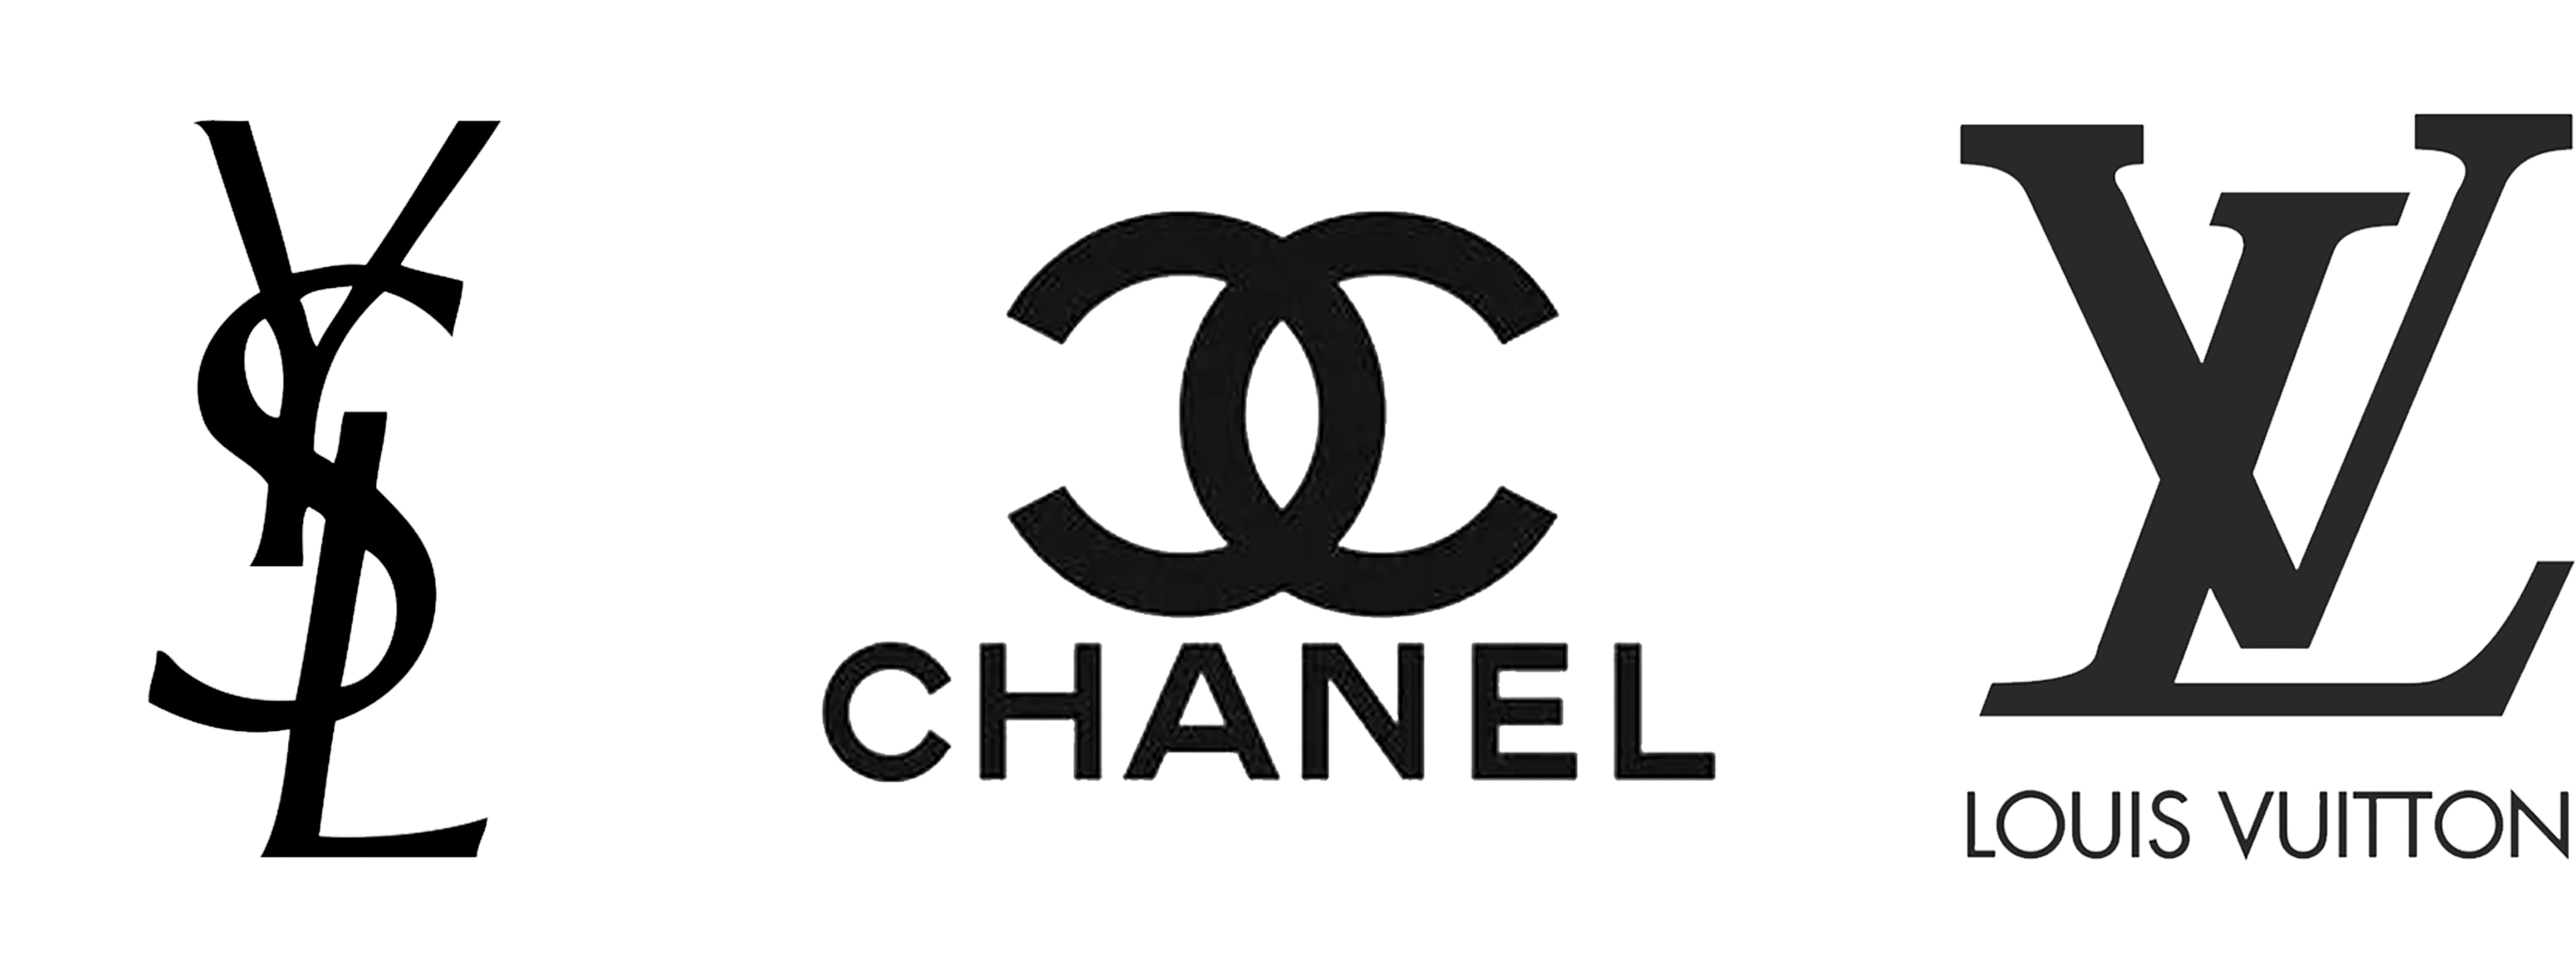 Logo Louis Vuitton Louis Vuitton Ysl Logo Clipart